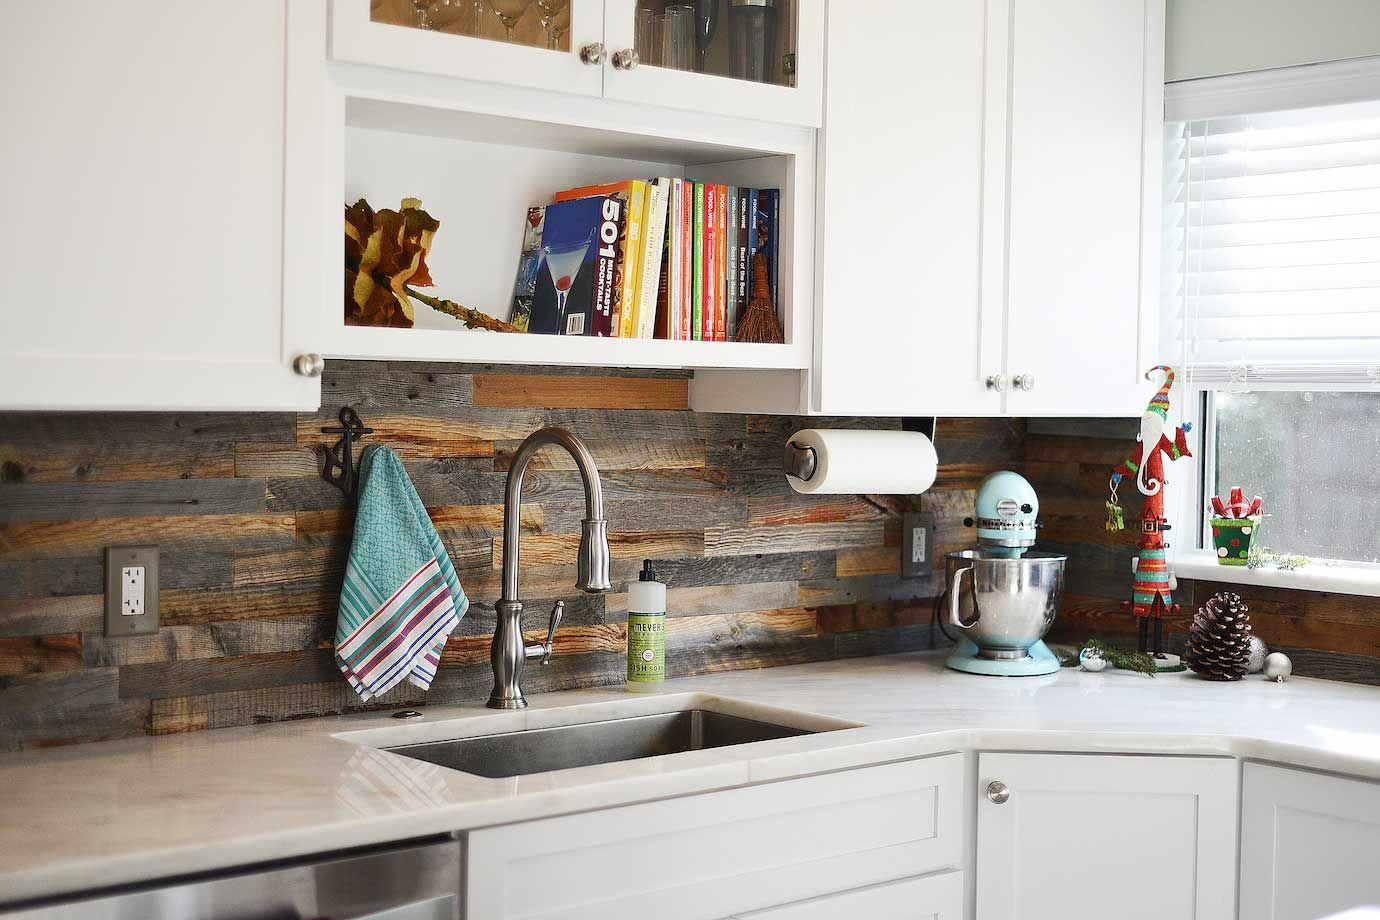 Stunning Wood Backsplash Ideas Yentua Com Wood Kitchen Backsplash Reclaimed Wood Kitchen Backsplash Kitchen White Cabinets